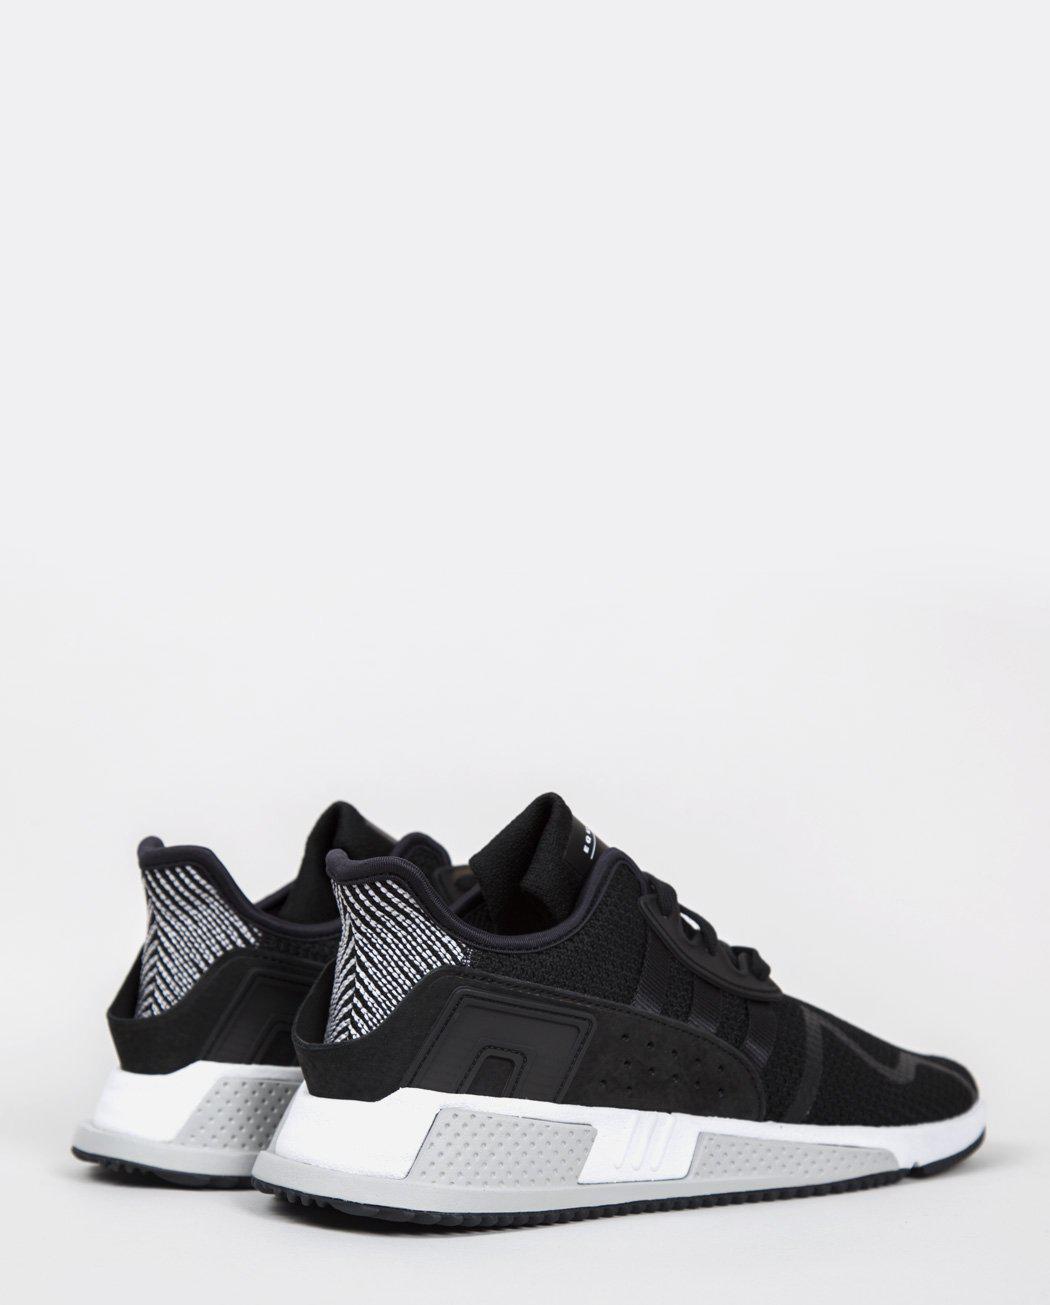 new styles 9239c 4cdca Adidas Originals Black Adidas Eqt Cushion Adv (by9506) for men